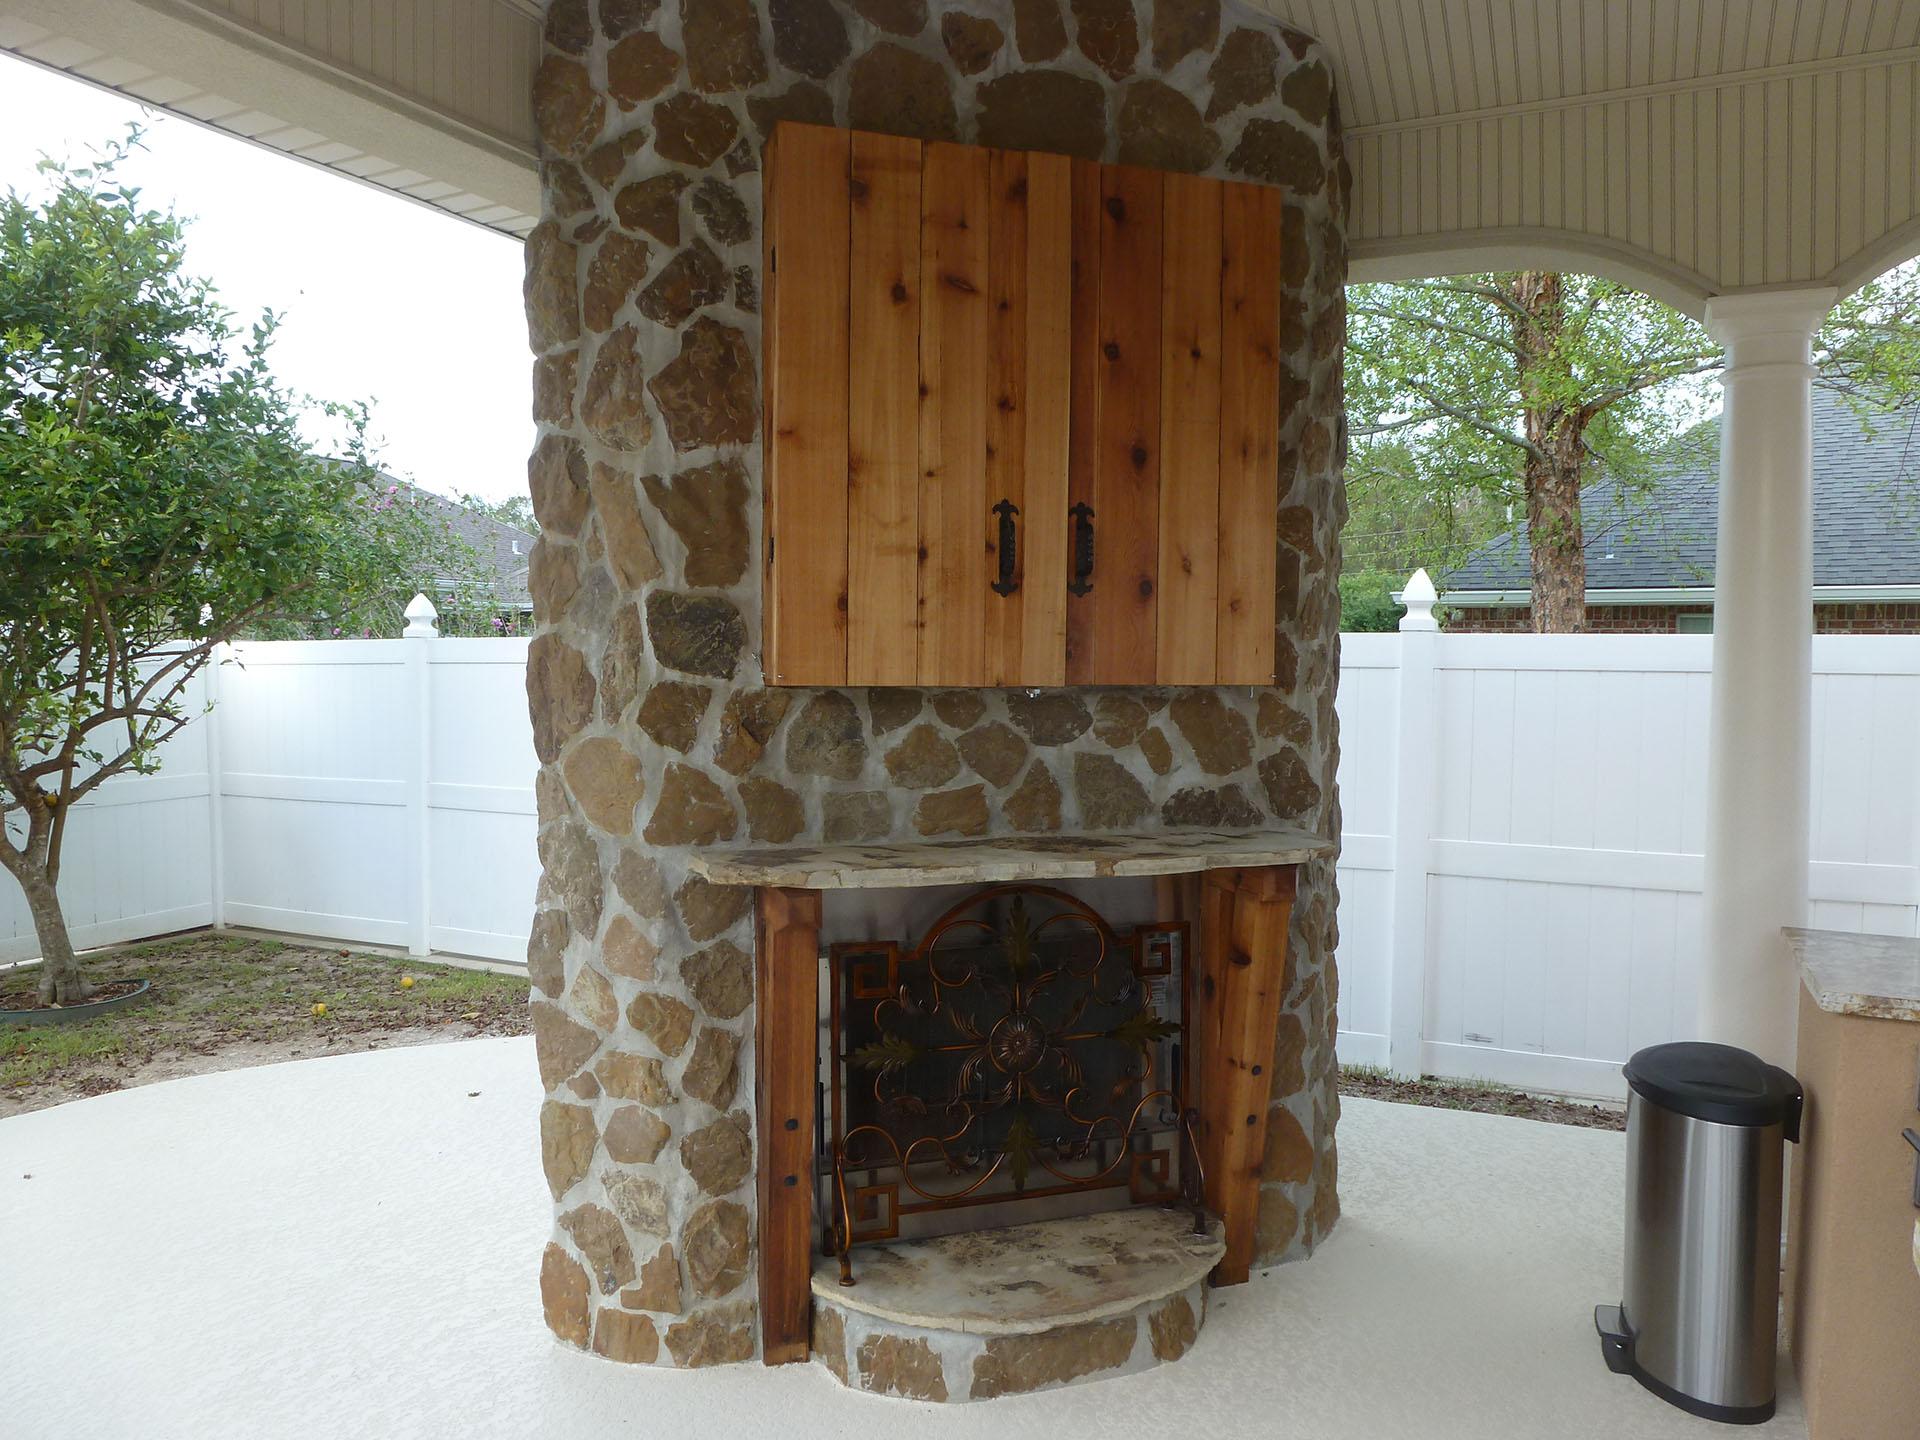 outdoor kitchens custom outdoor concepts. Black Bedroom Furniture Sets. Home Design Ideas